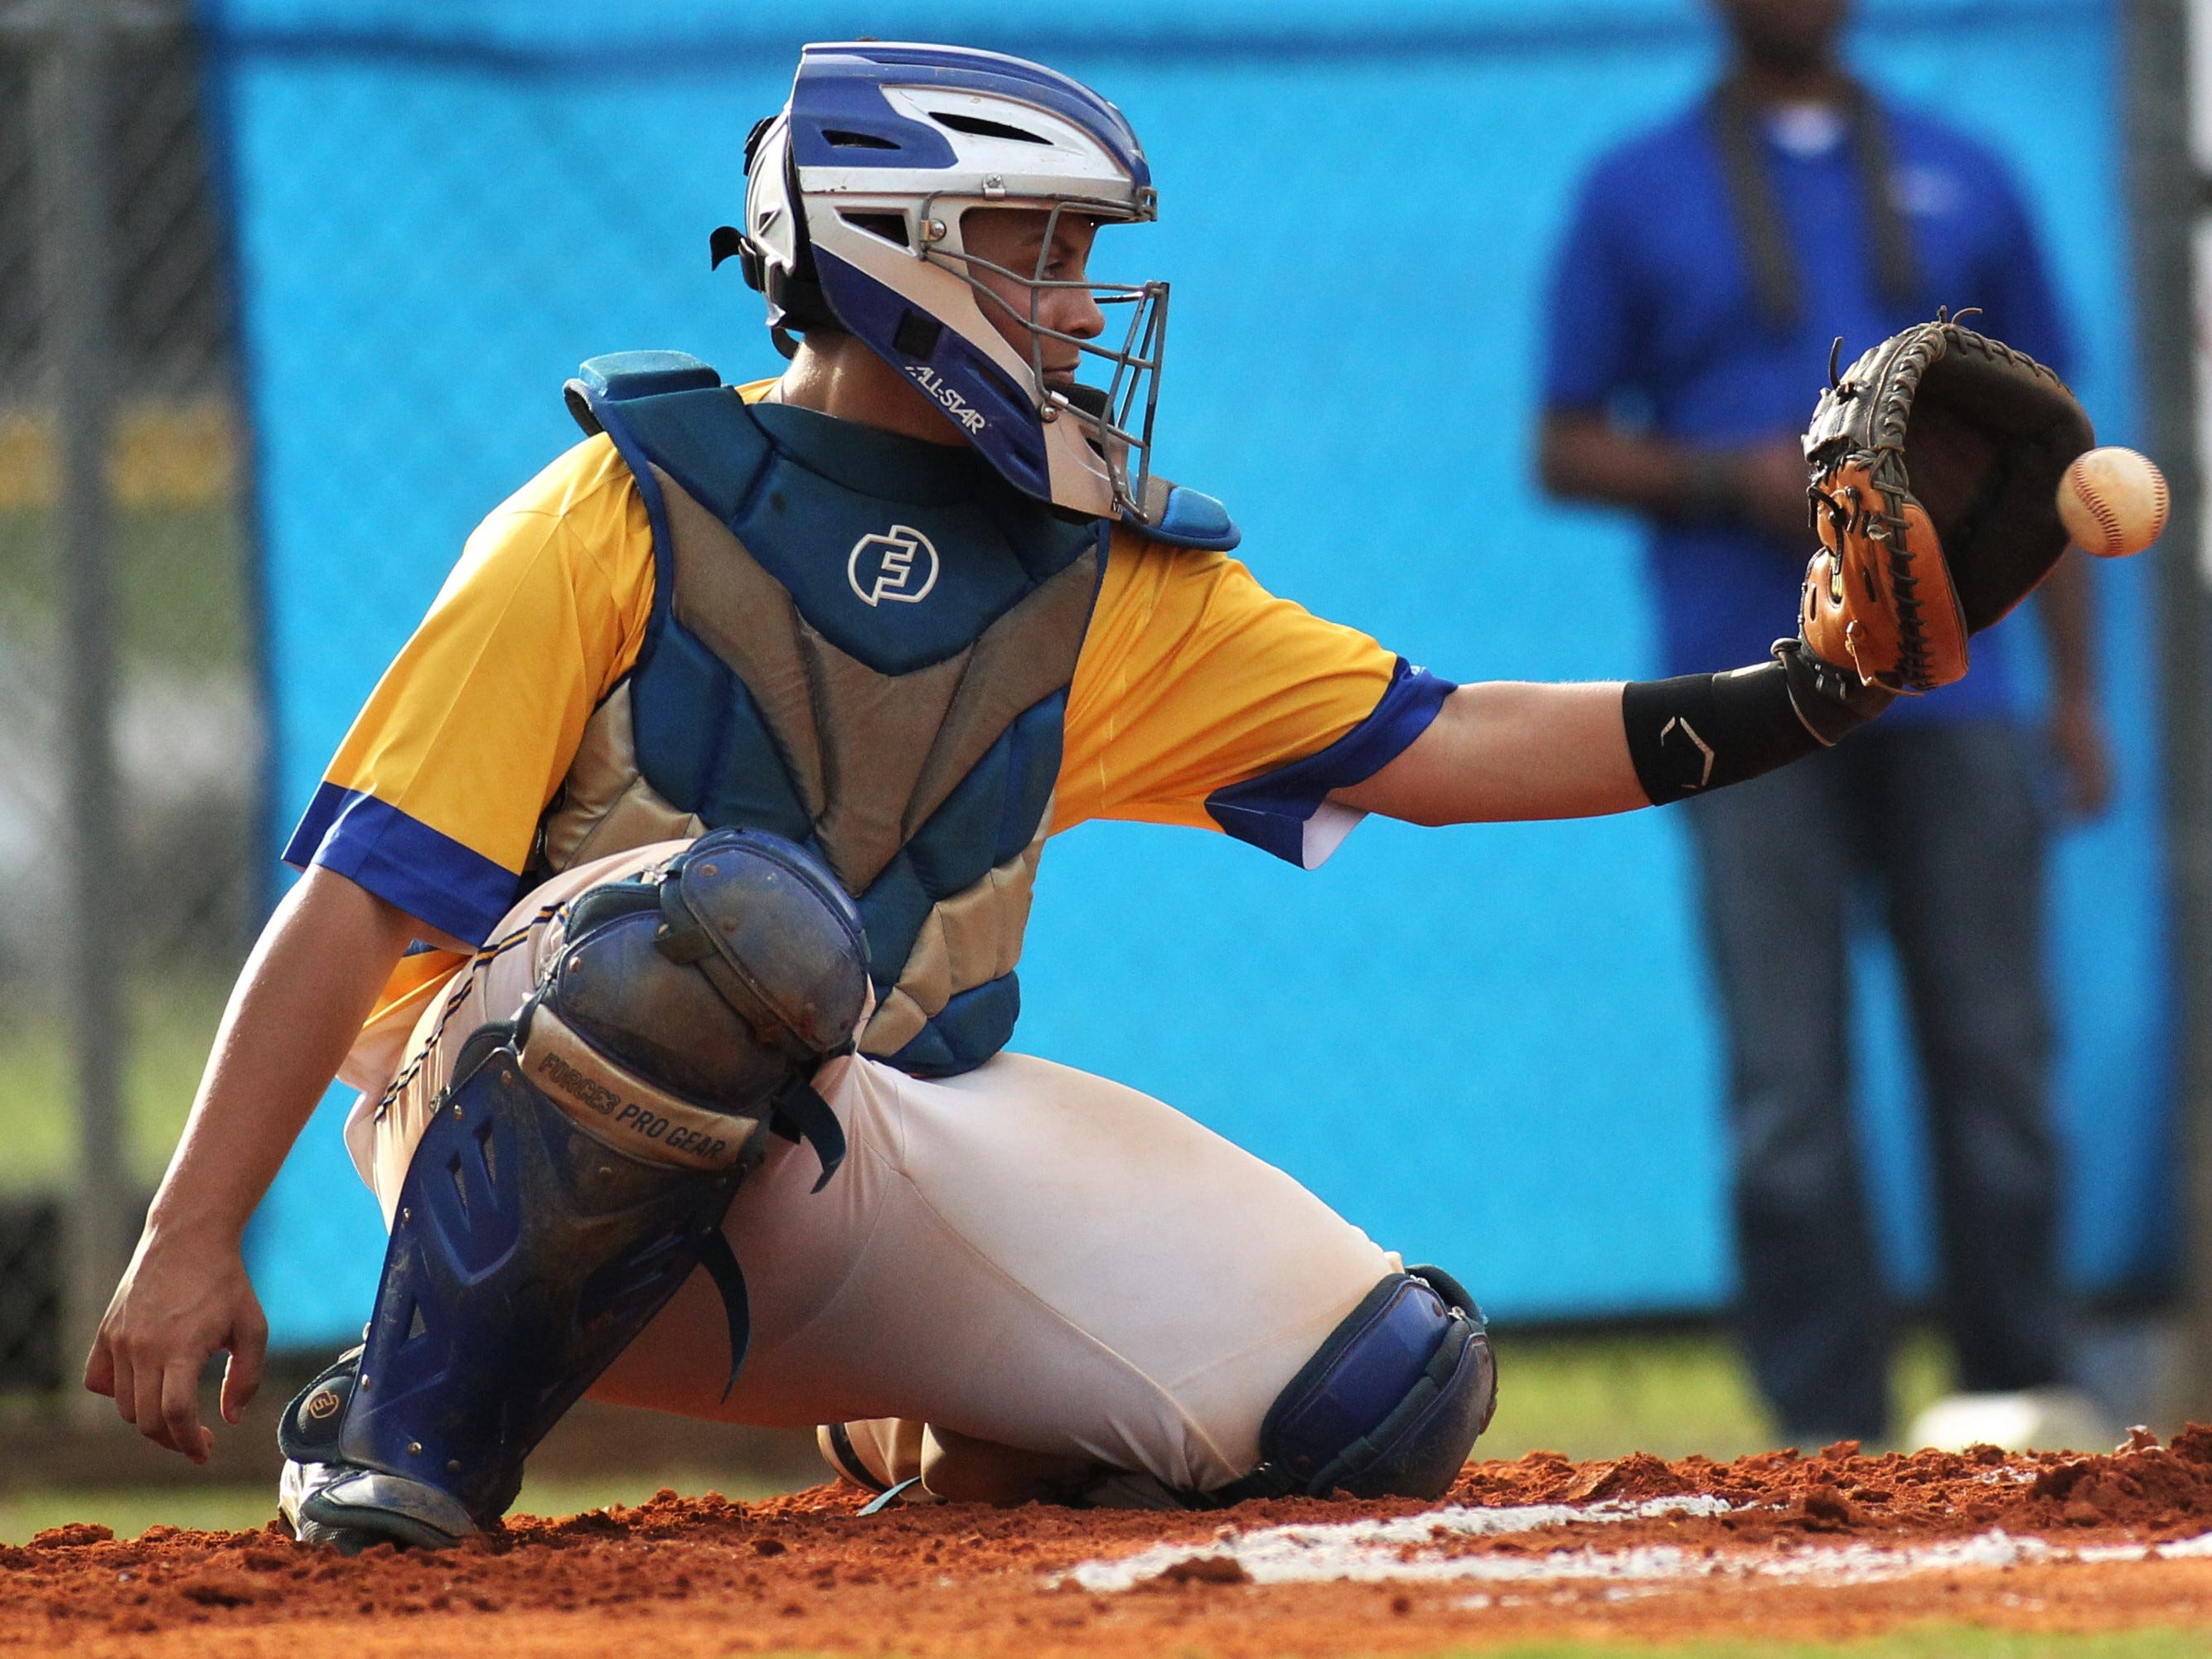 Rickards junior catcher Jayden Figueroa catches a pitch as Rickards beat Gadsden County 18-0 in three innings on Friday, April 12, 2019.